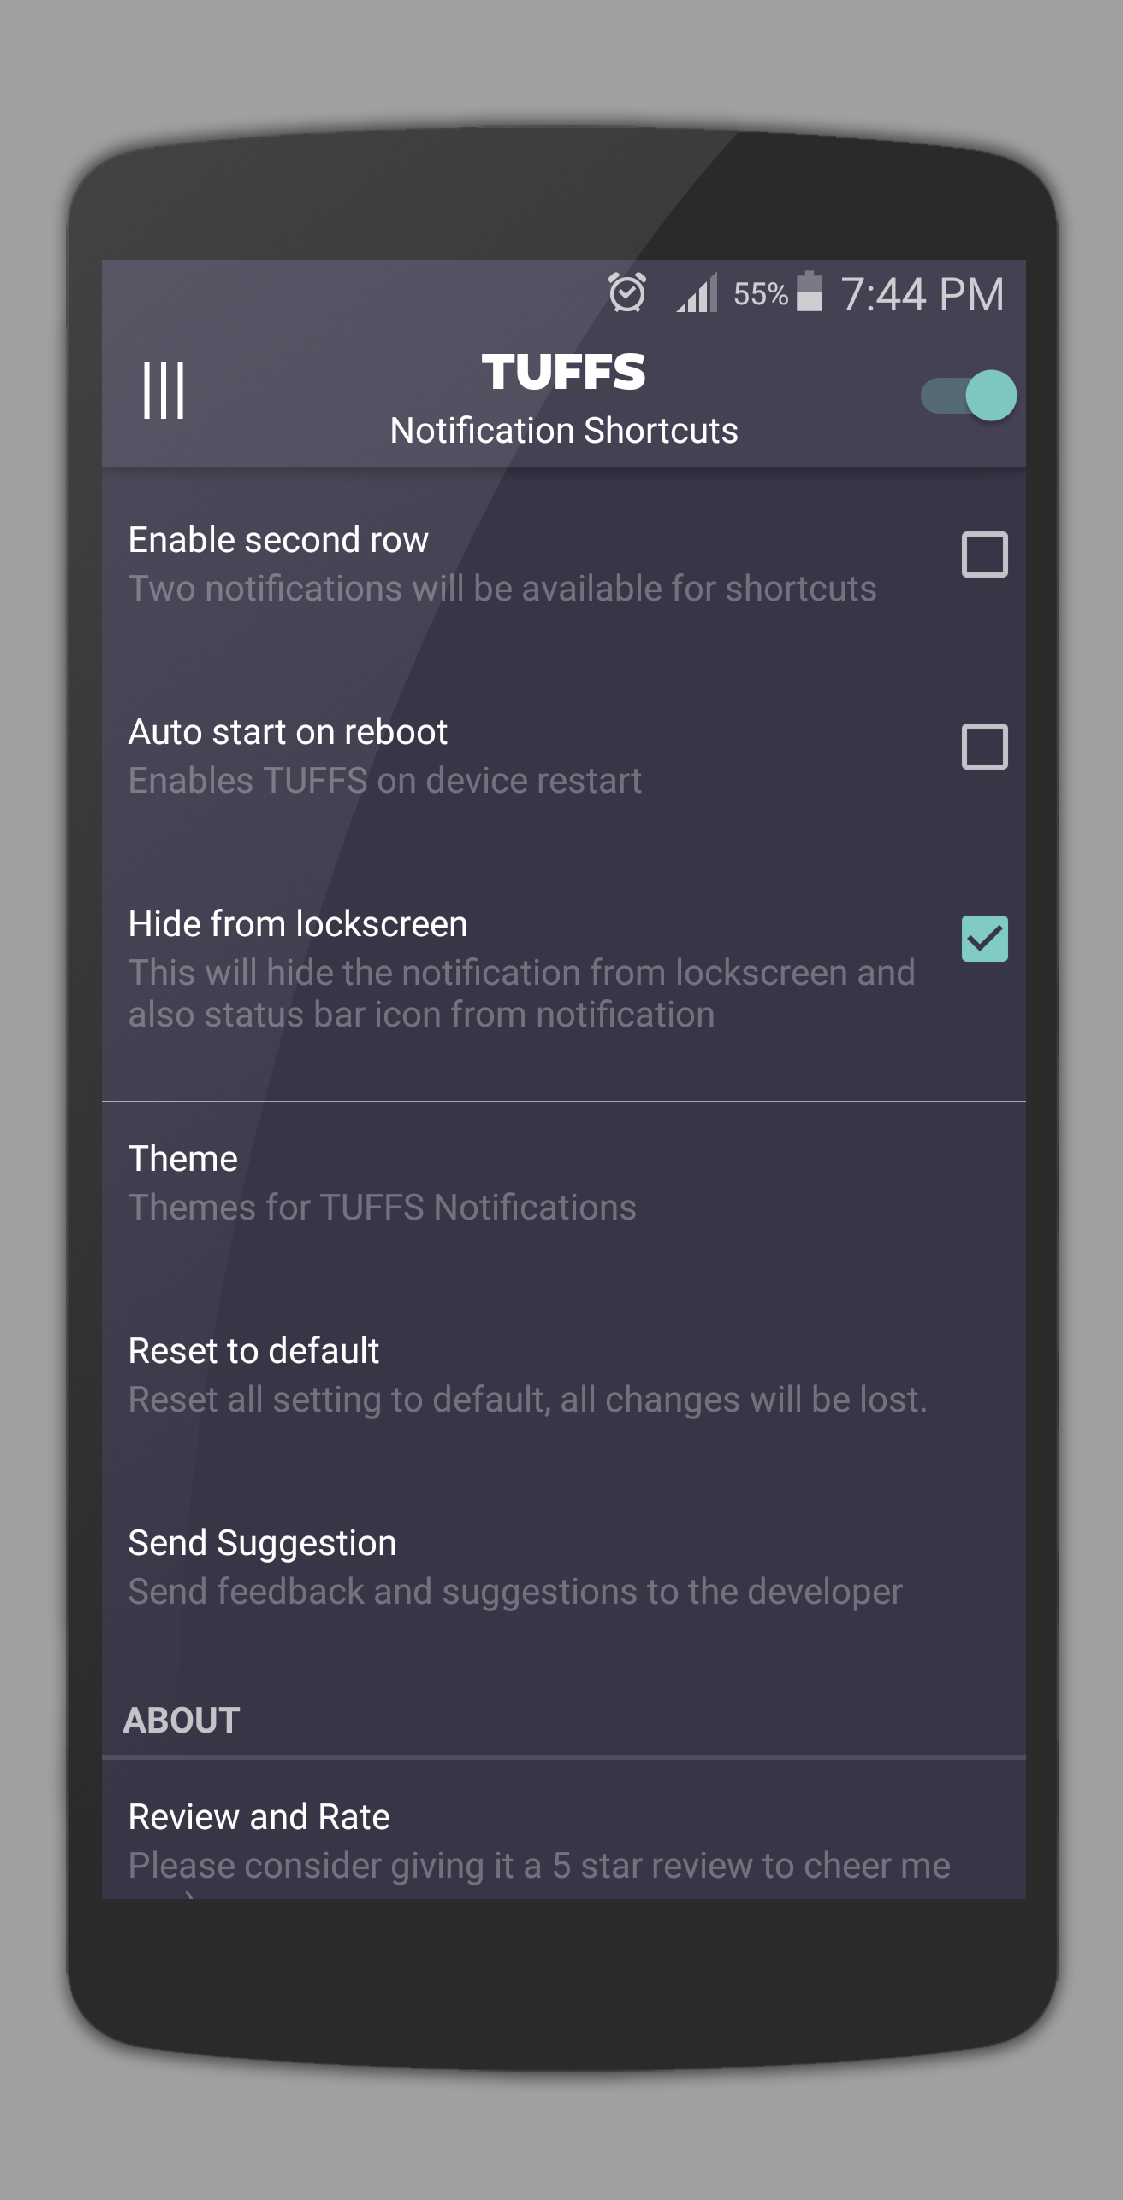 TUFFS Notification Shortcuts